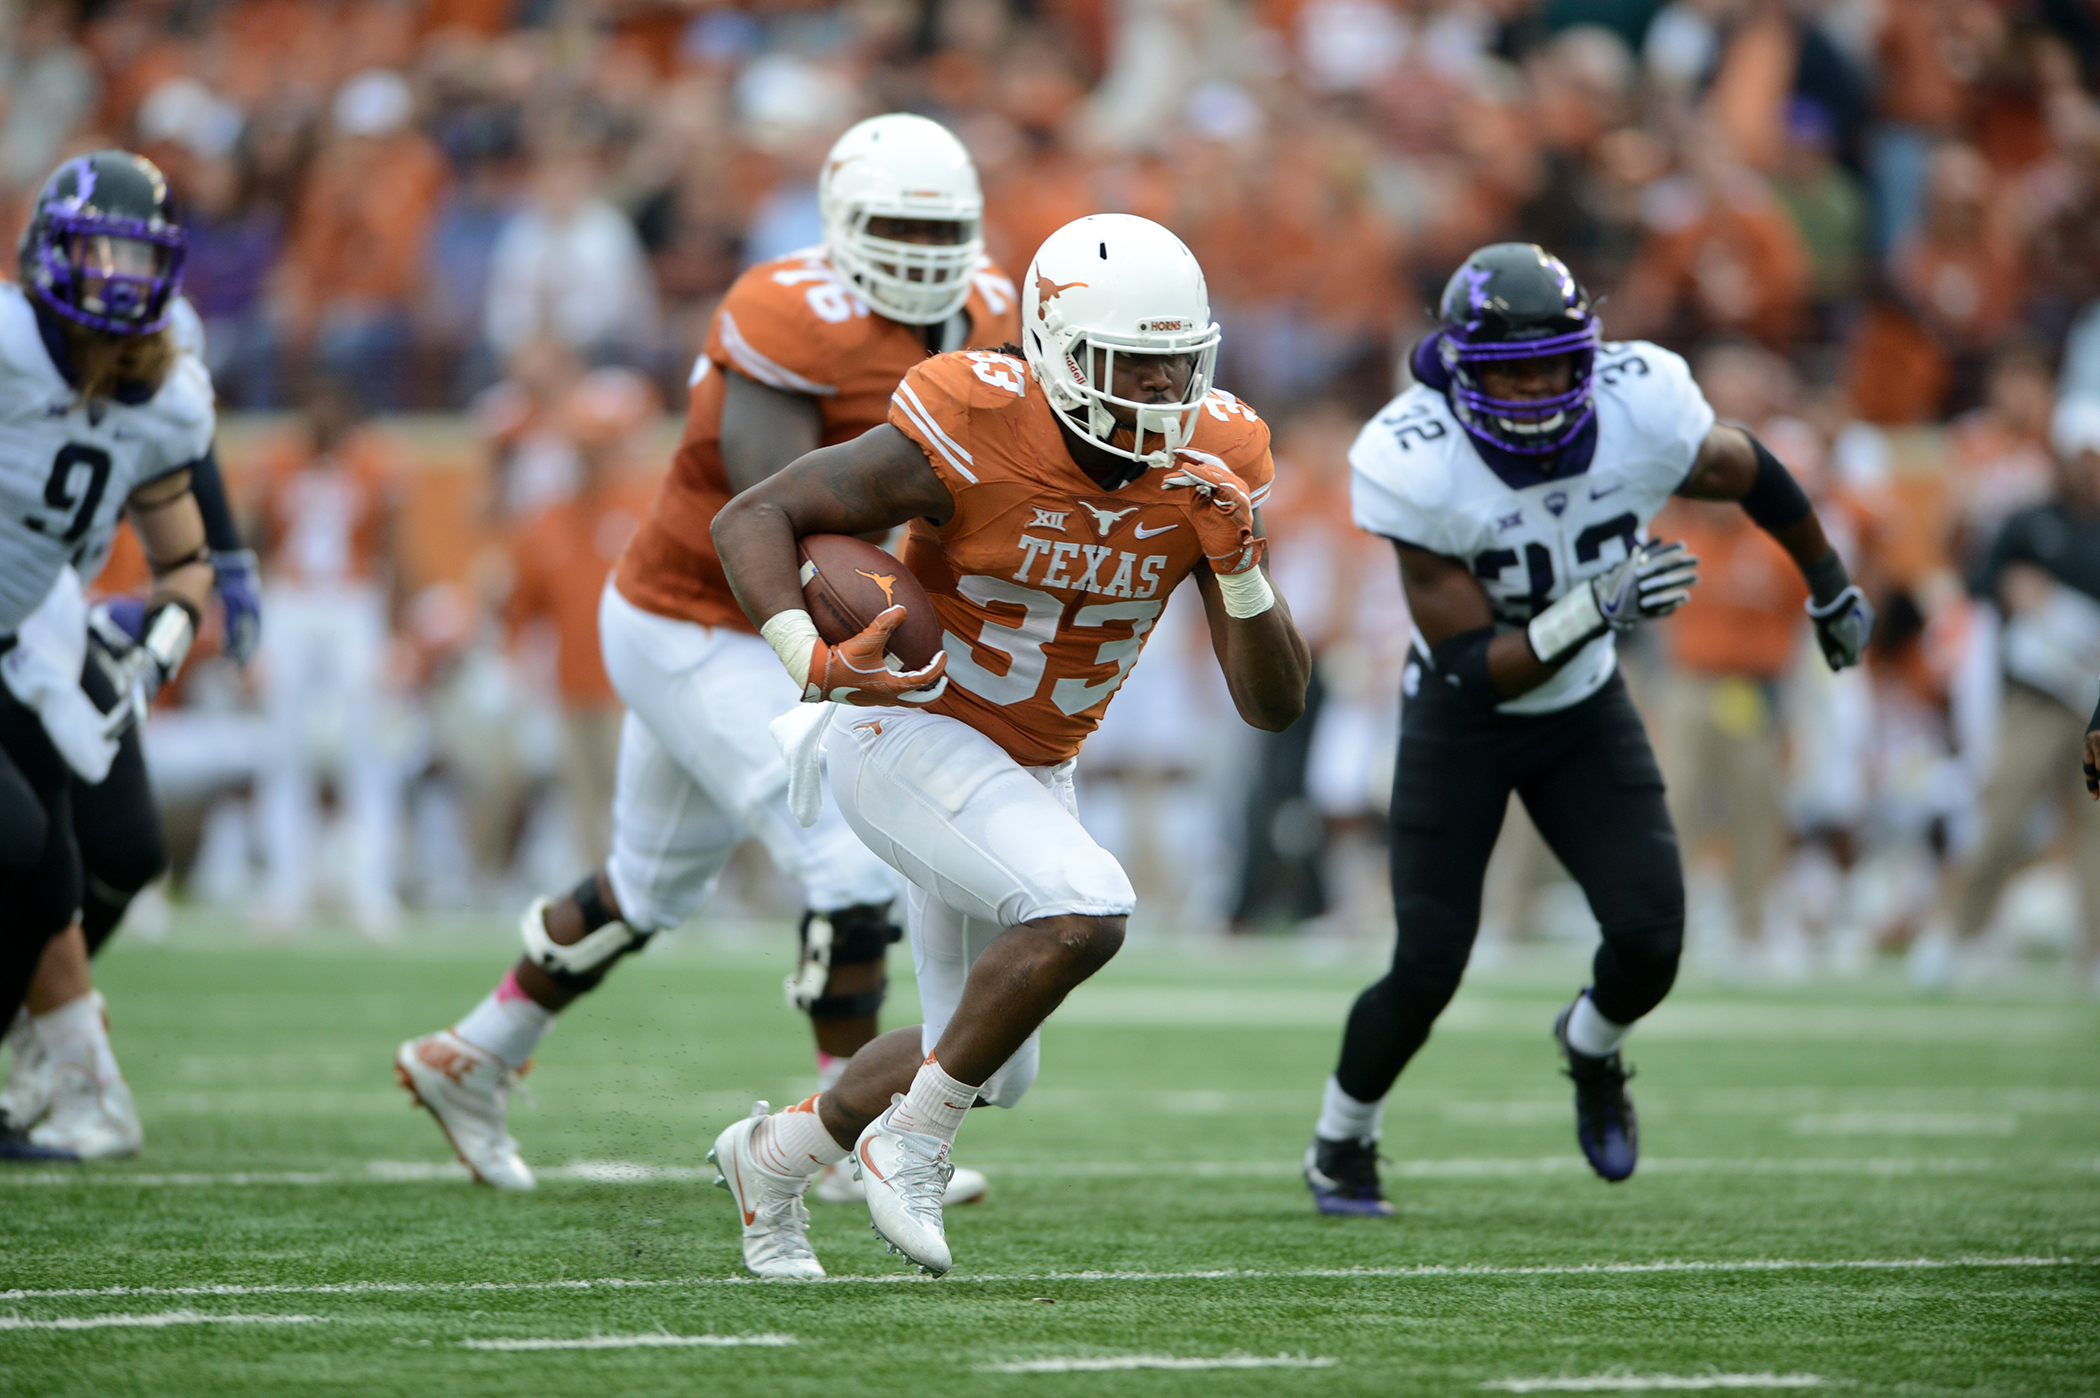 NCAA FOOTBALL: NOV 25 TCU at Texas